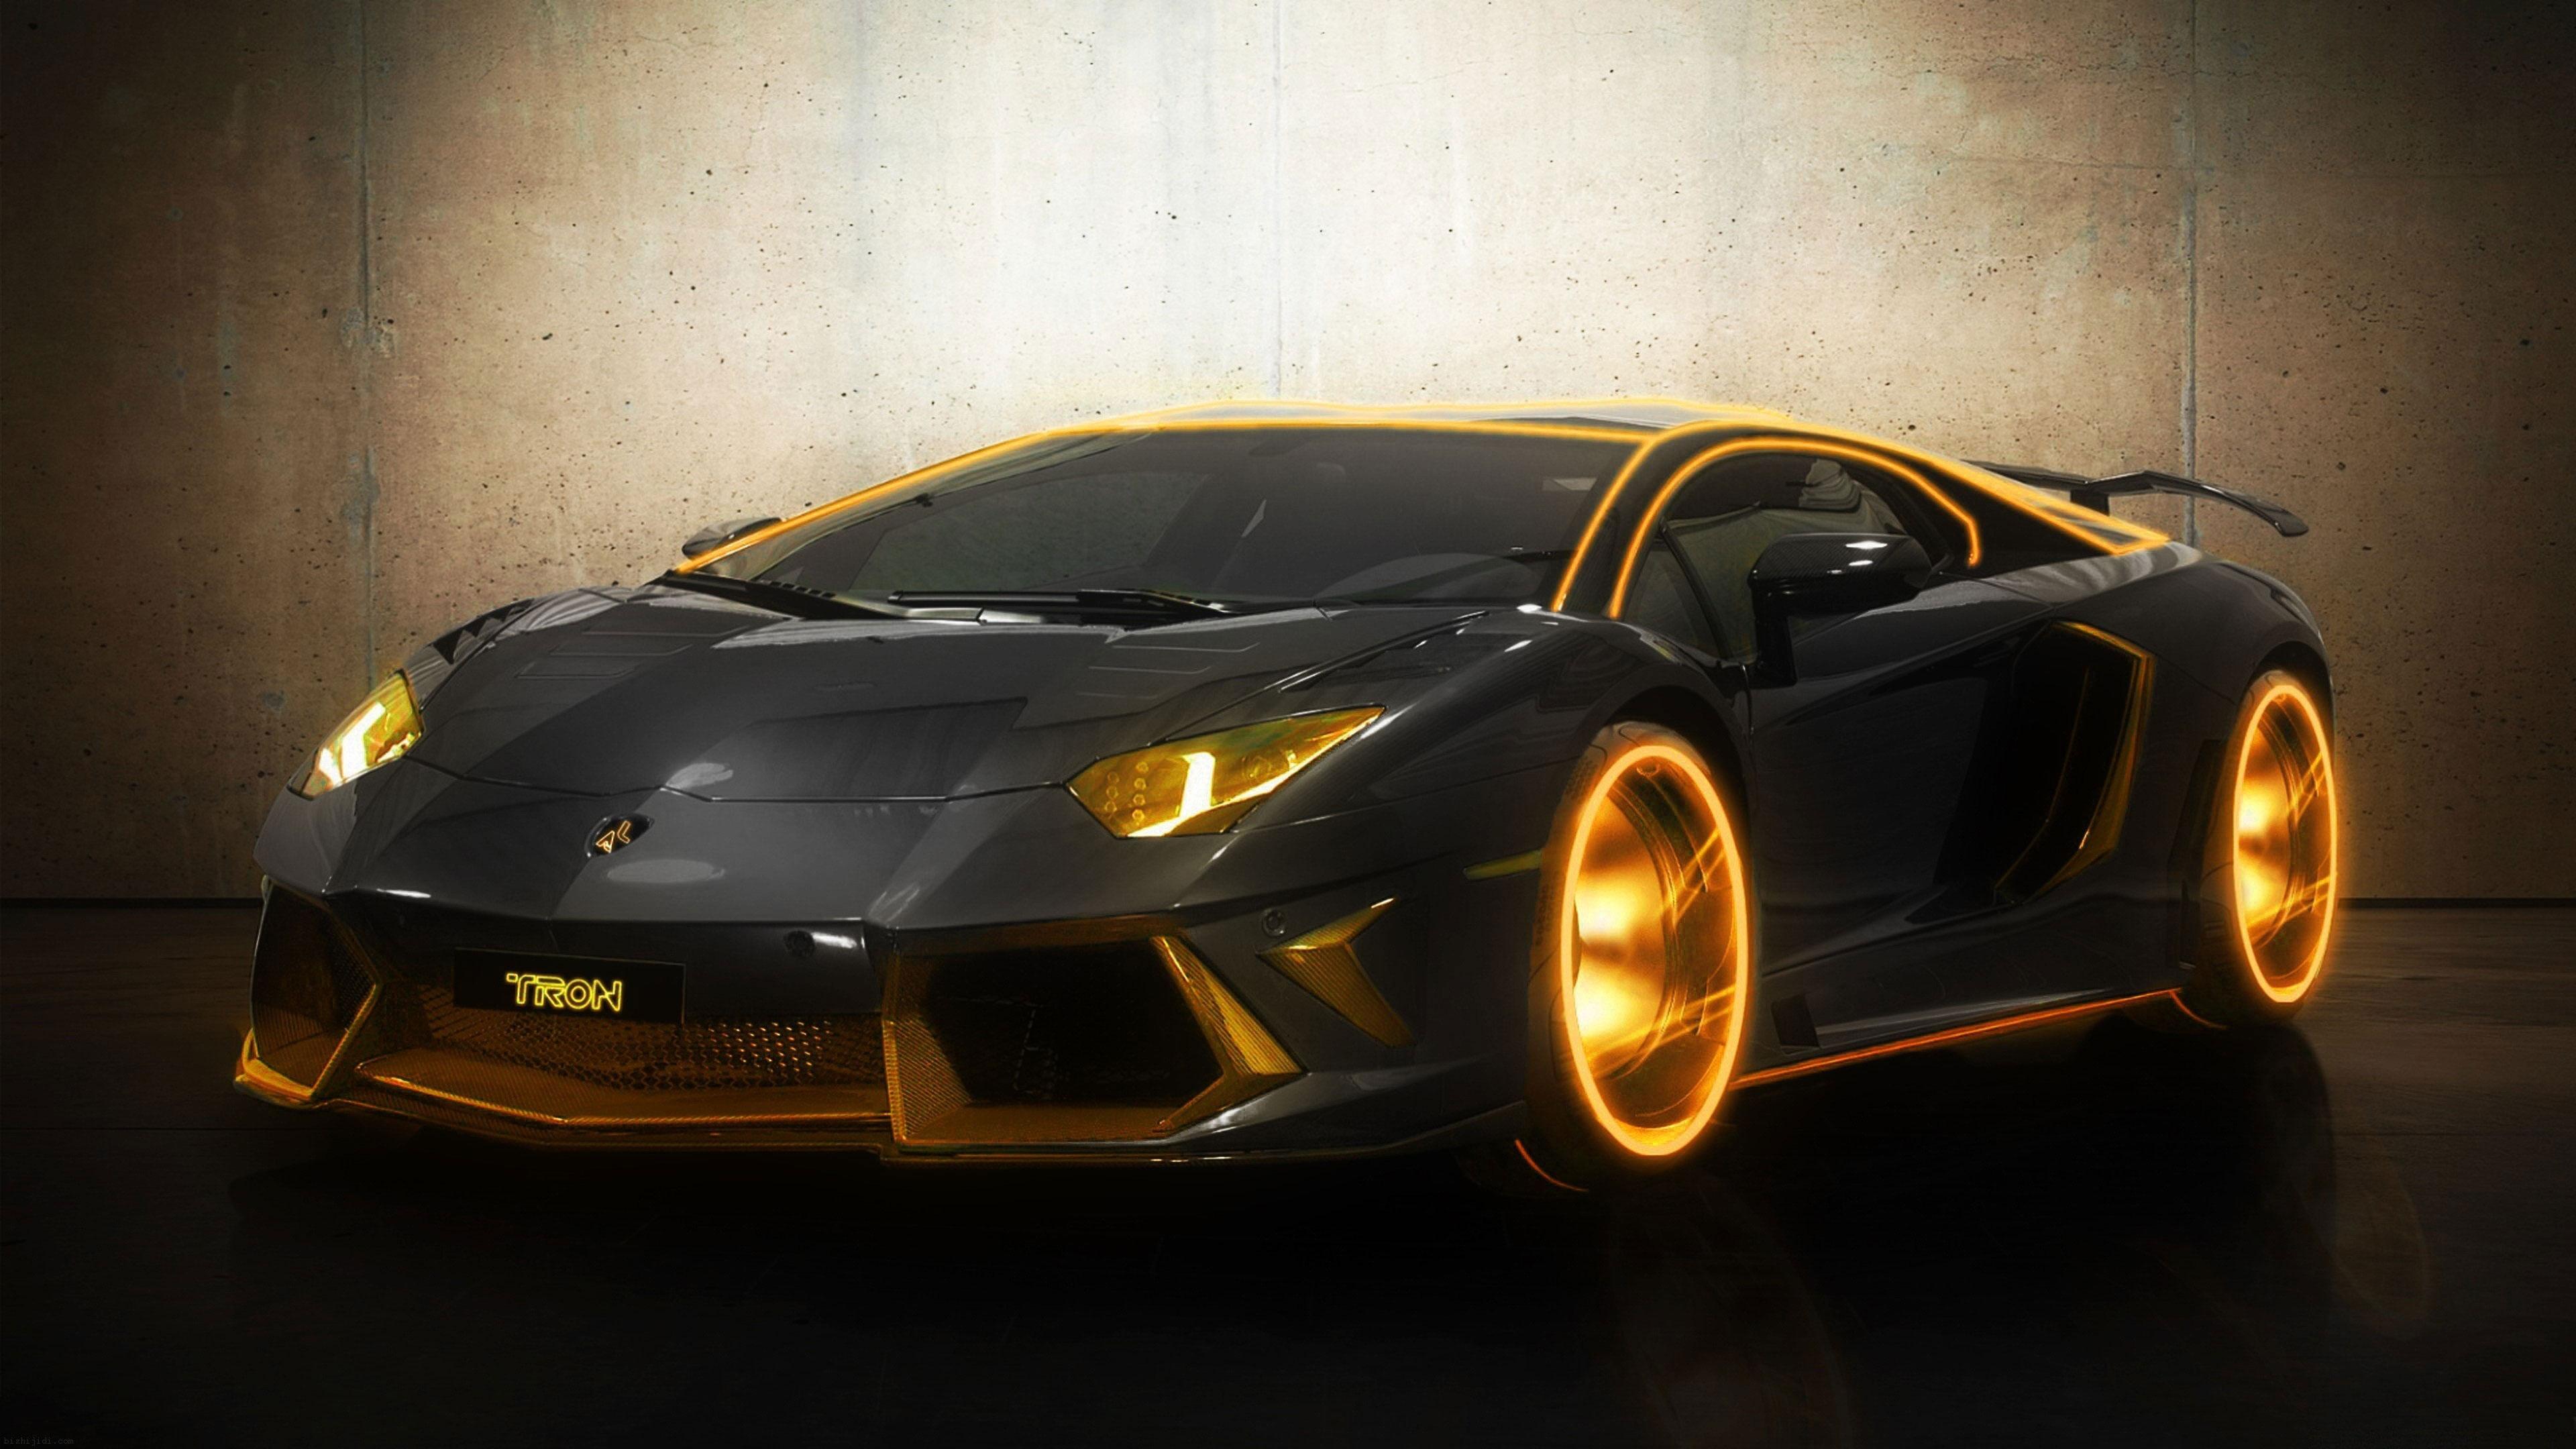 Luxury Lamborghini Aventador Tron Gold Wallpaper HD Nice 3840x2160